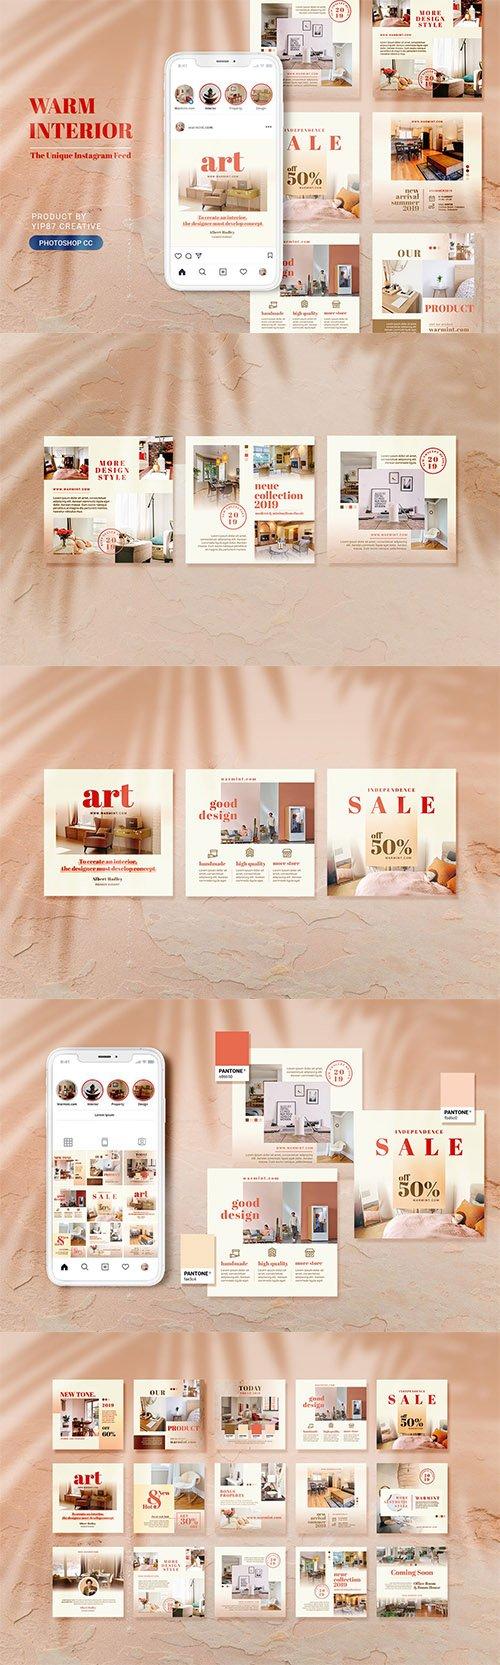 Furniture and Interior Design Social Media Post